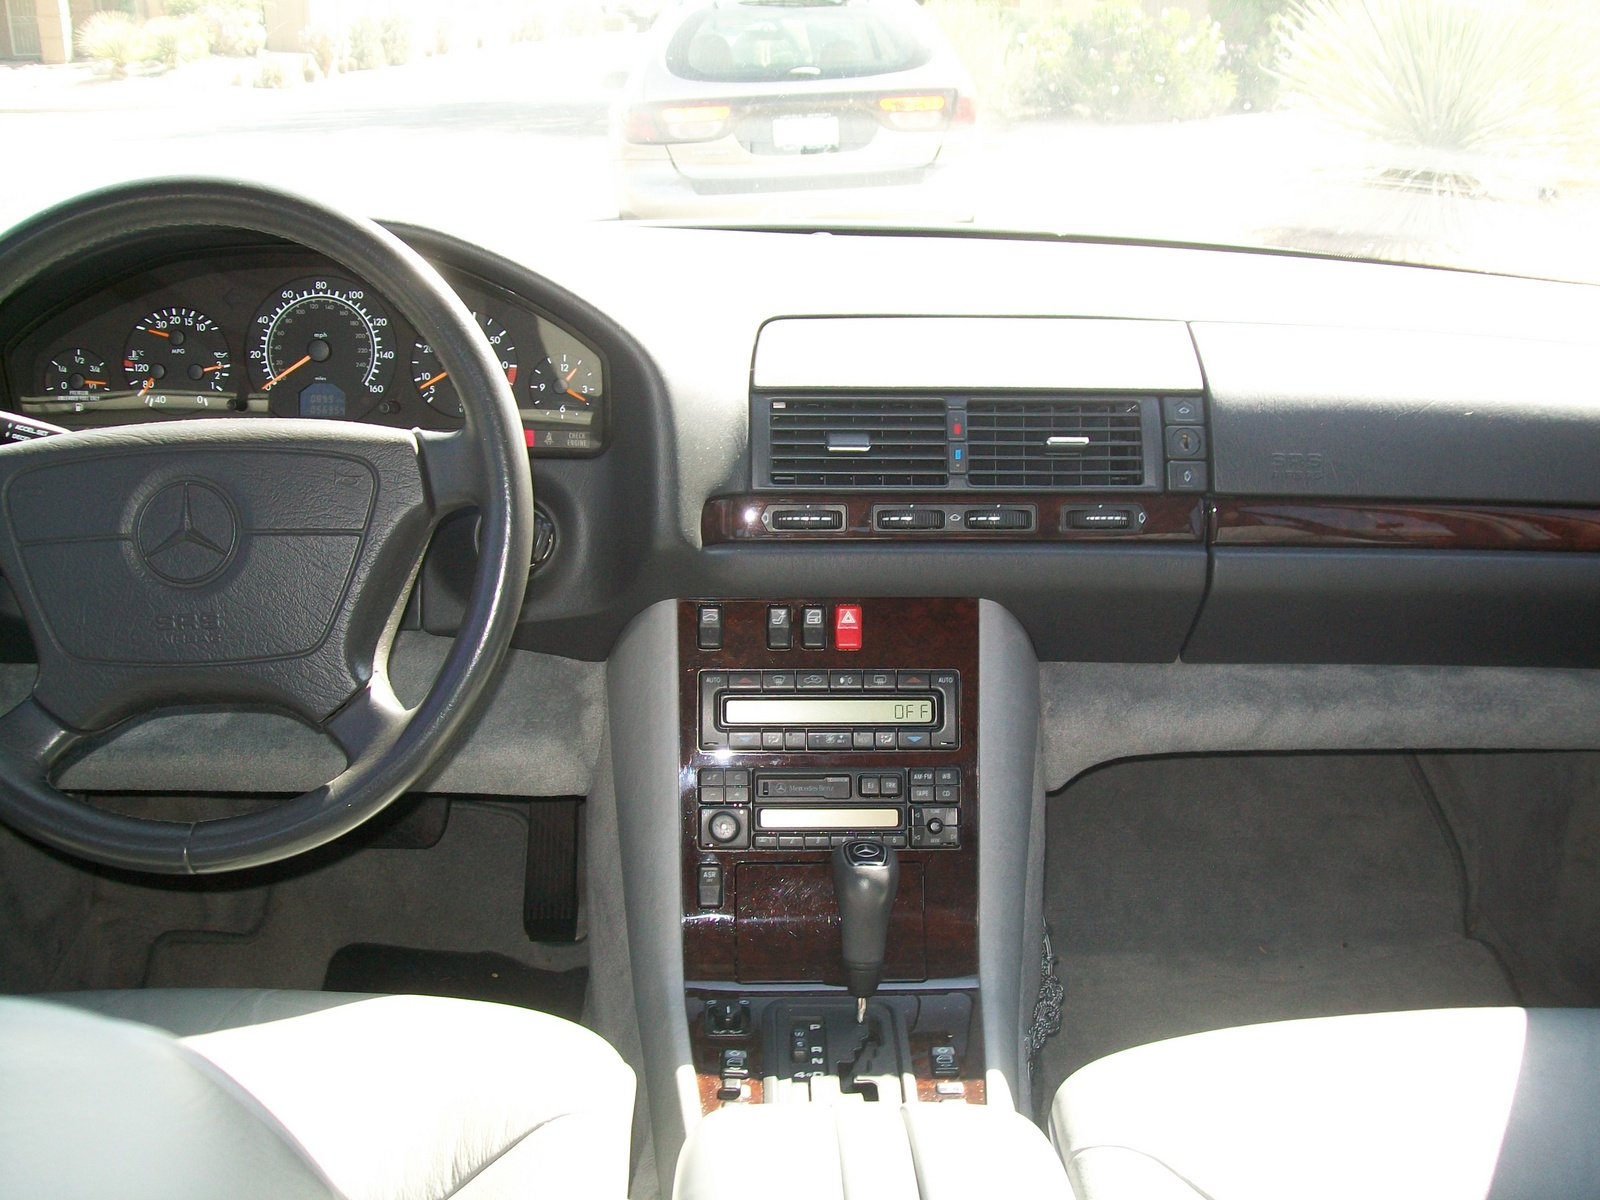 1999 mercedes benz s class interior pictures cargurus for 1999 mercedes benz s420